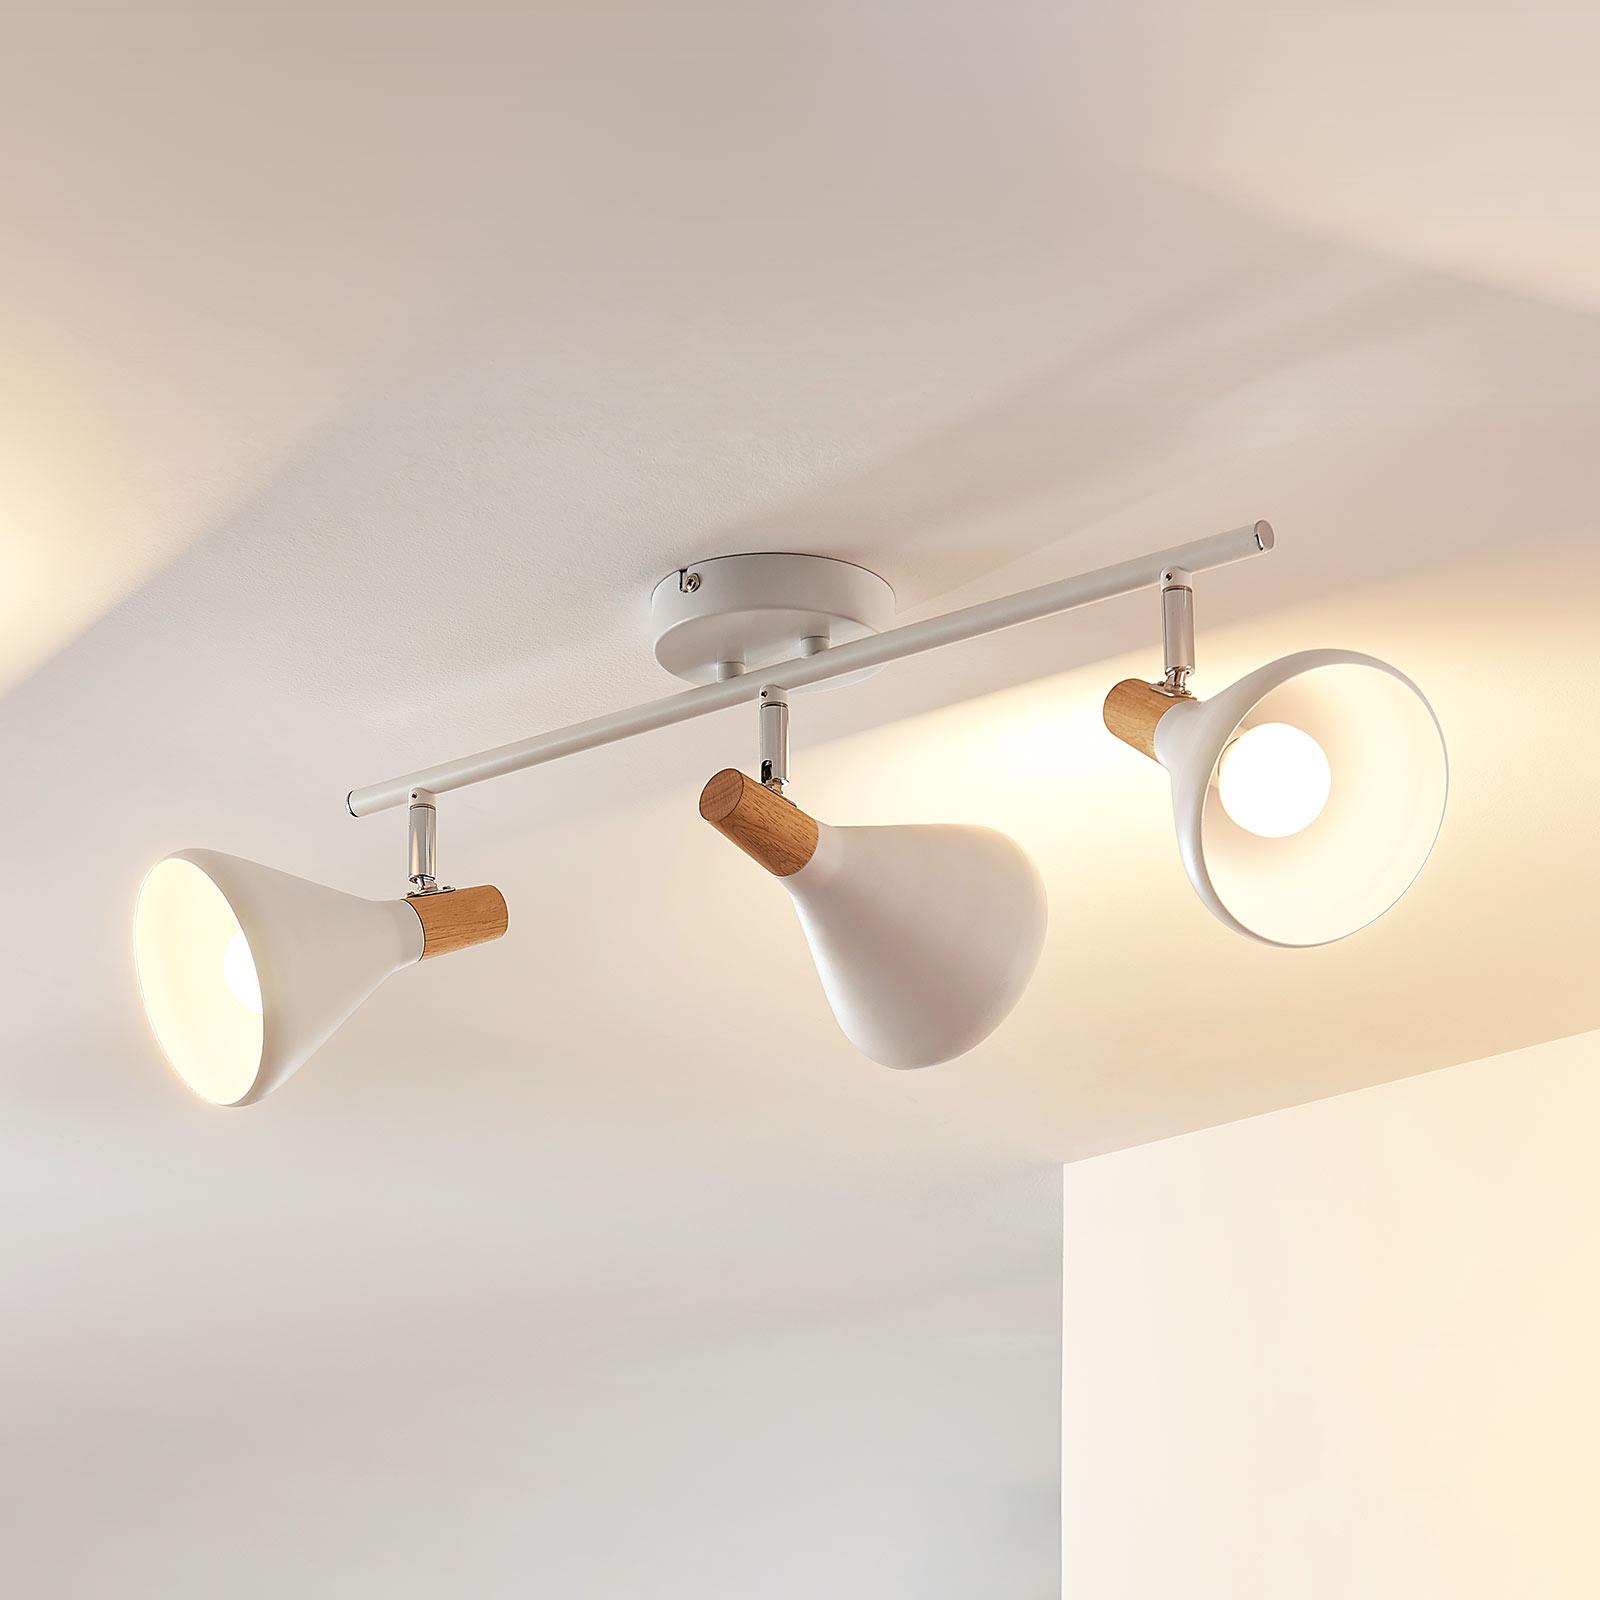 LED-Deckenlampe Arina in Weiß, 3-flammig, lang